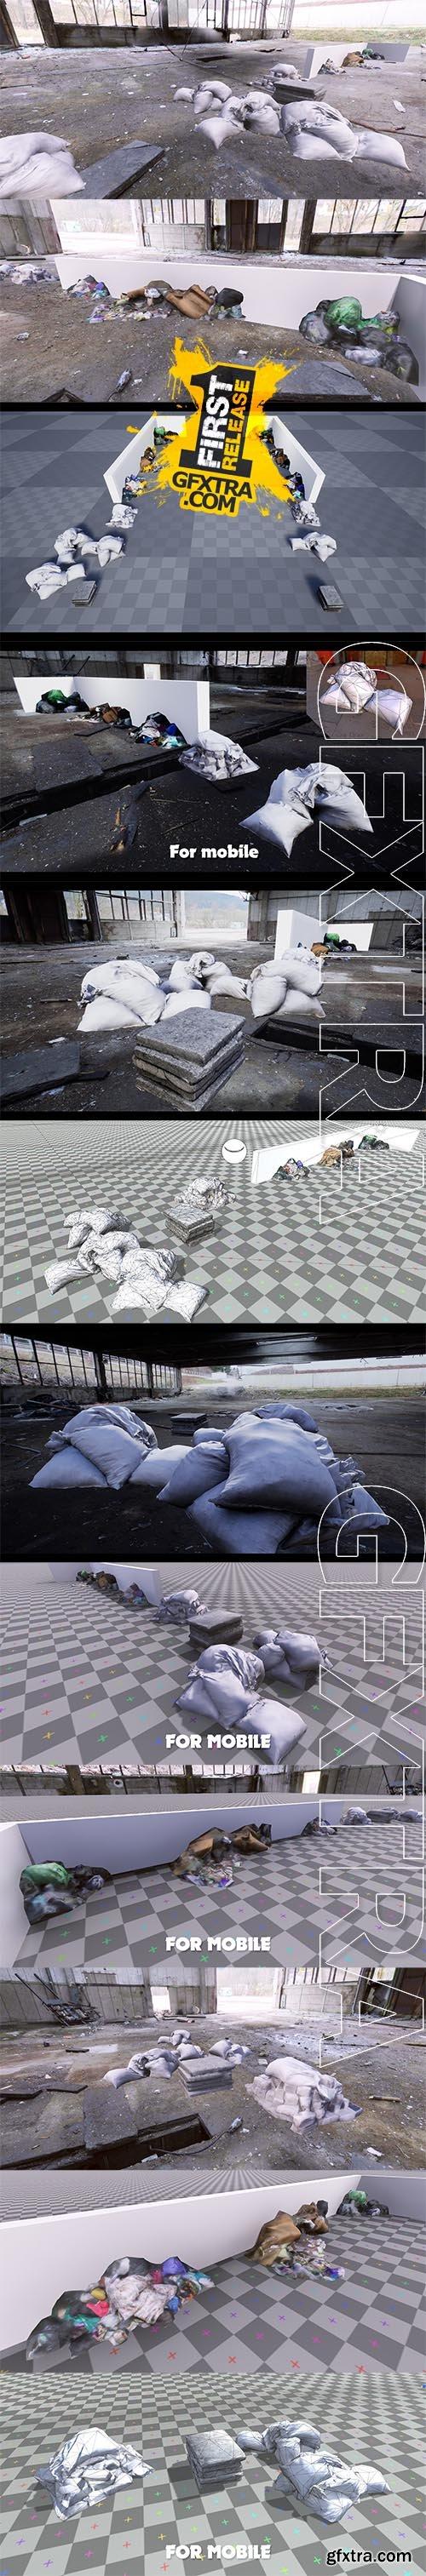 Cubebrush - 3D Scanned Trash